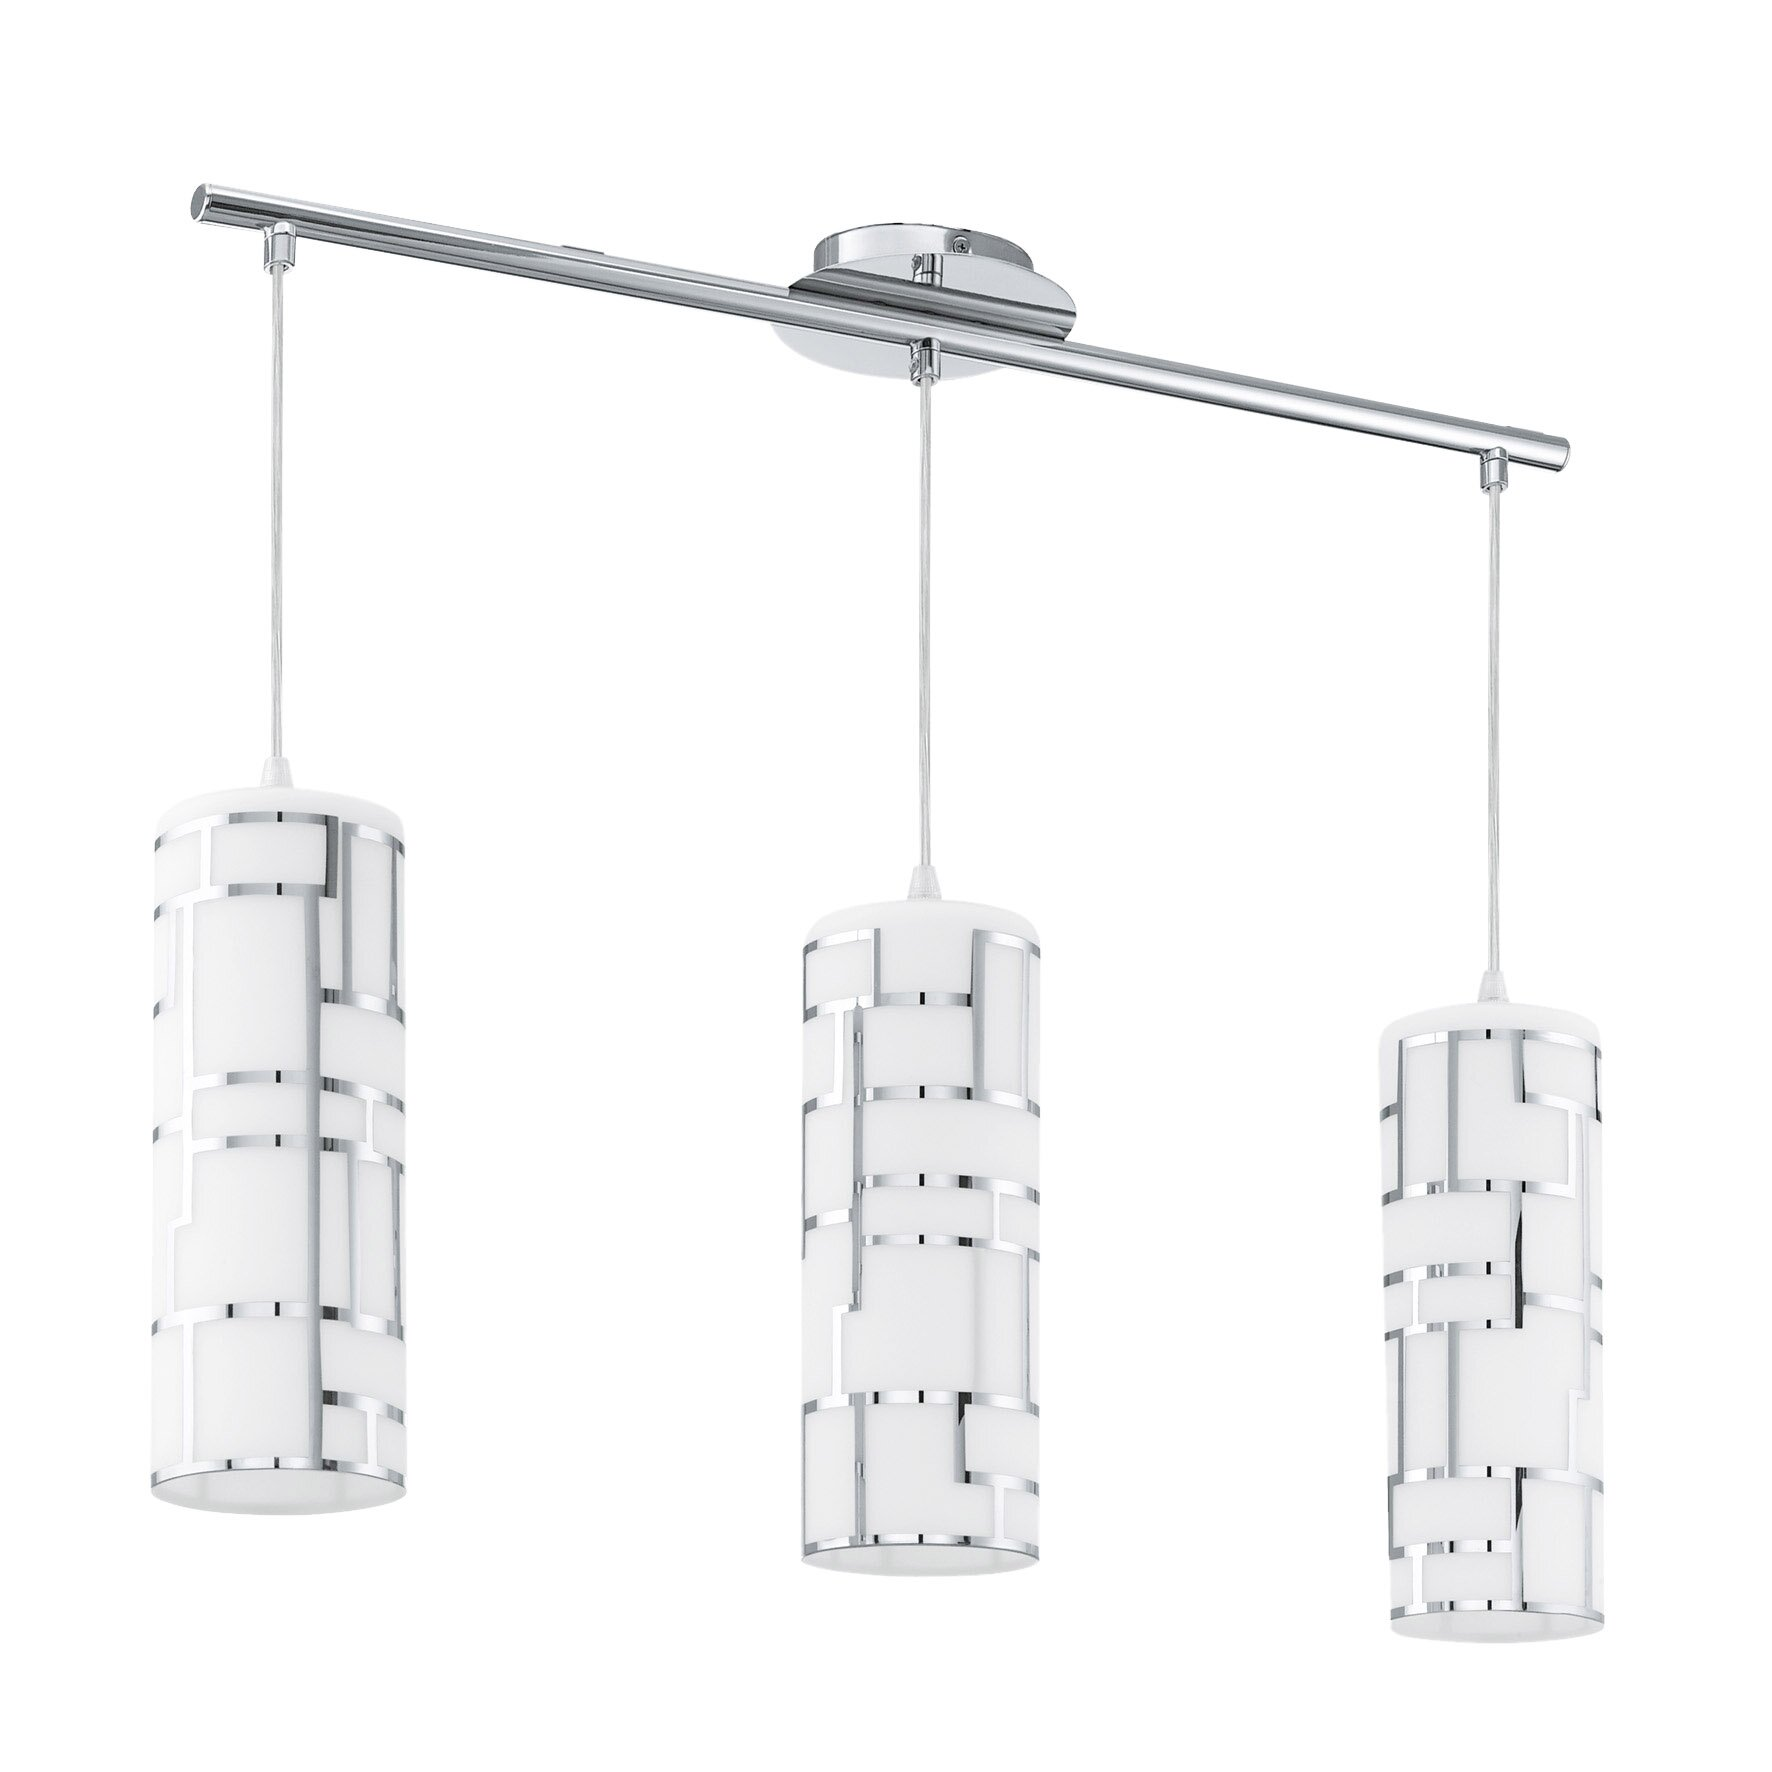 Eglo bayman 3 light kitchen island pendant reviews wayfair for 3 light pendant island kitchen lighting